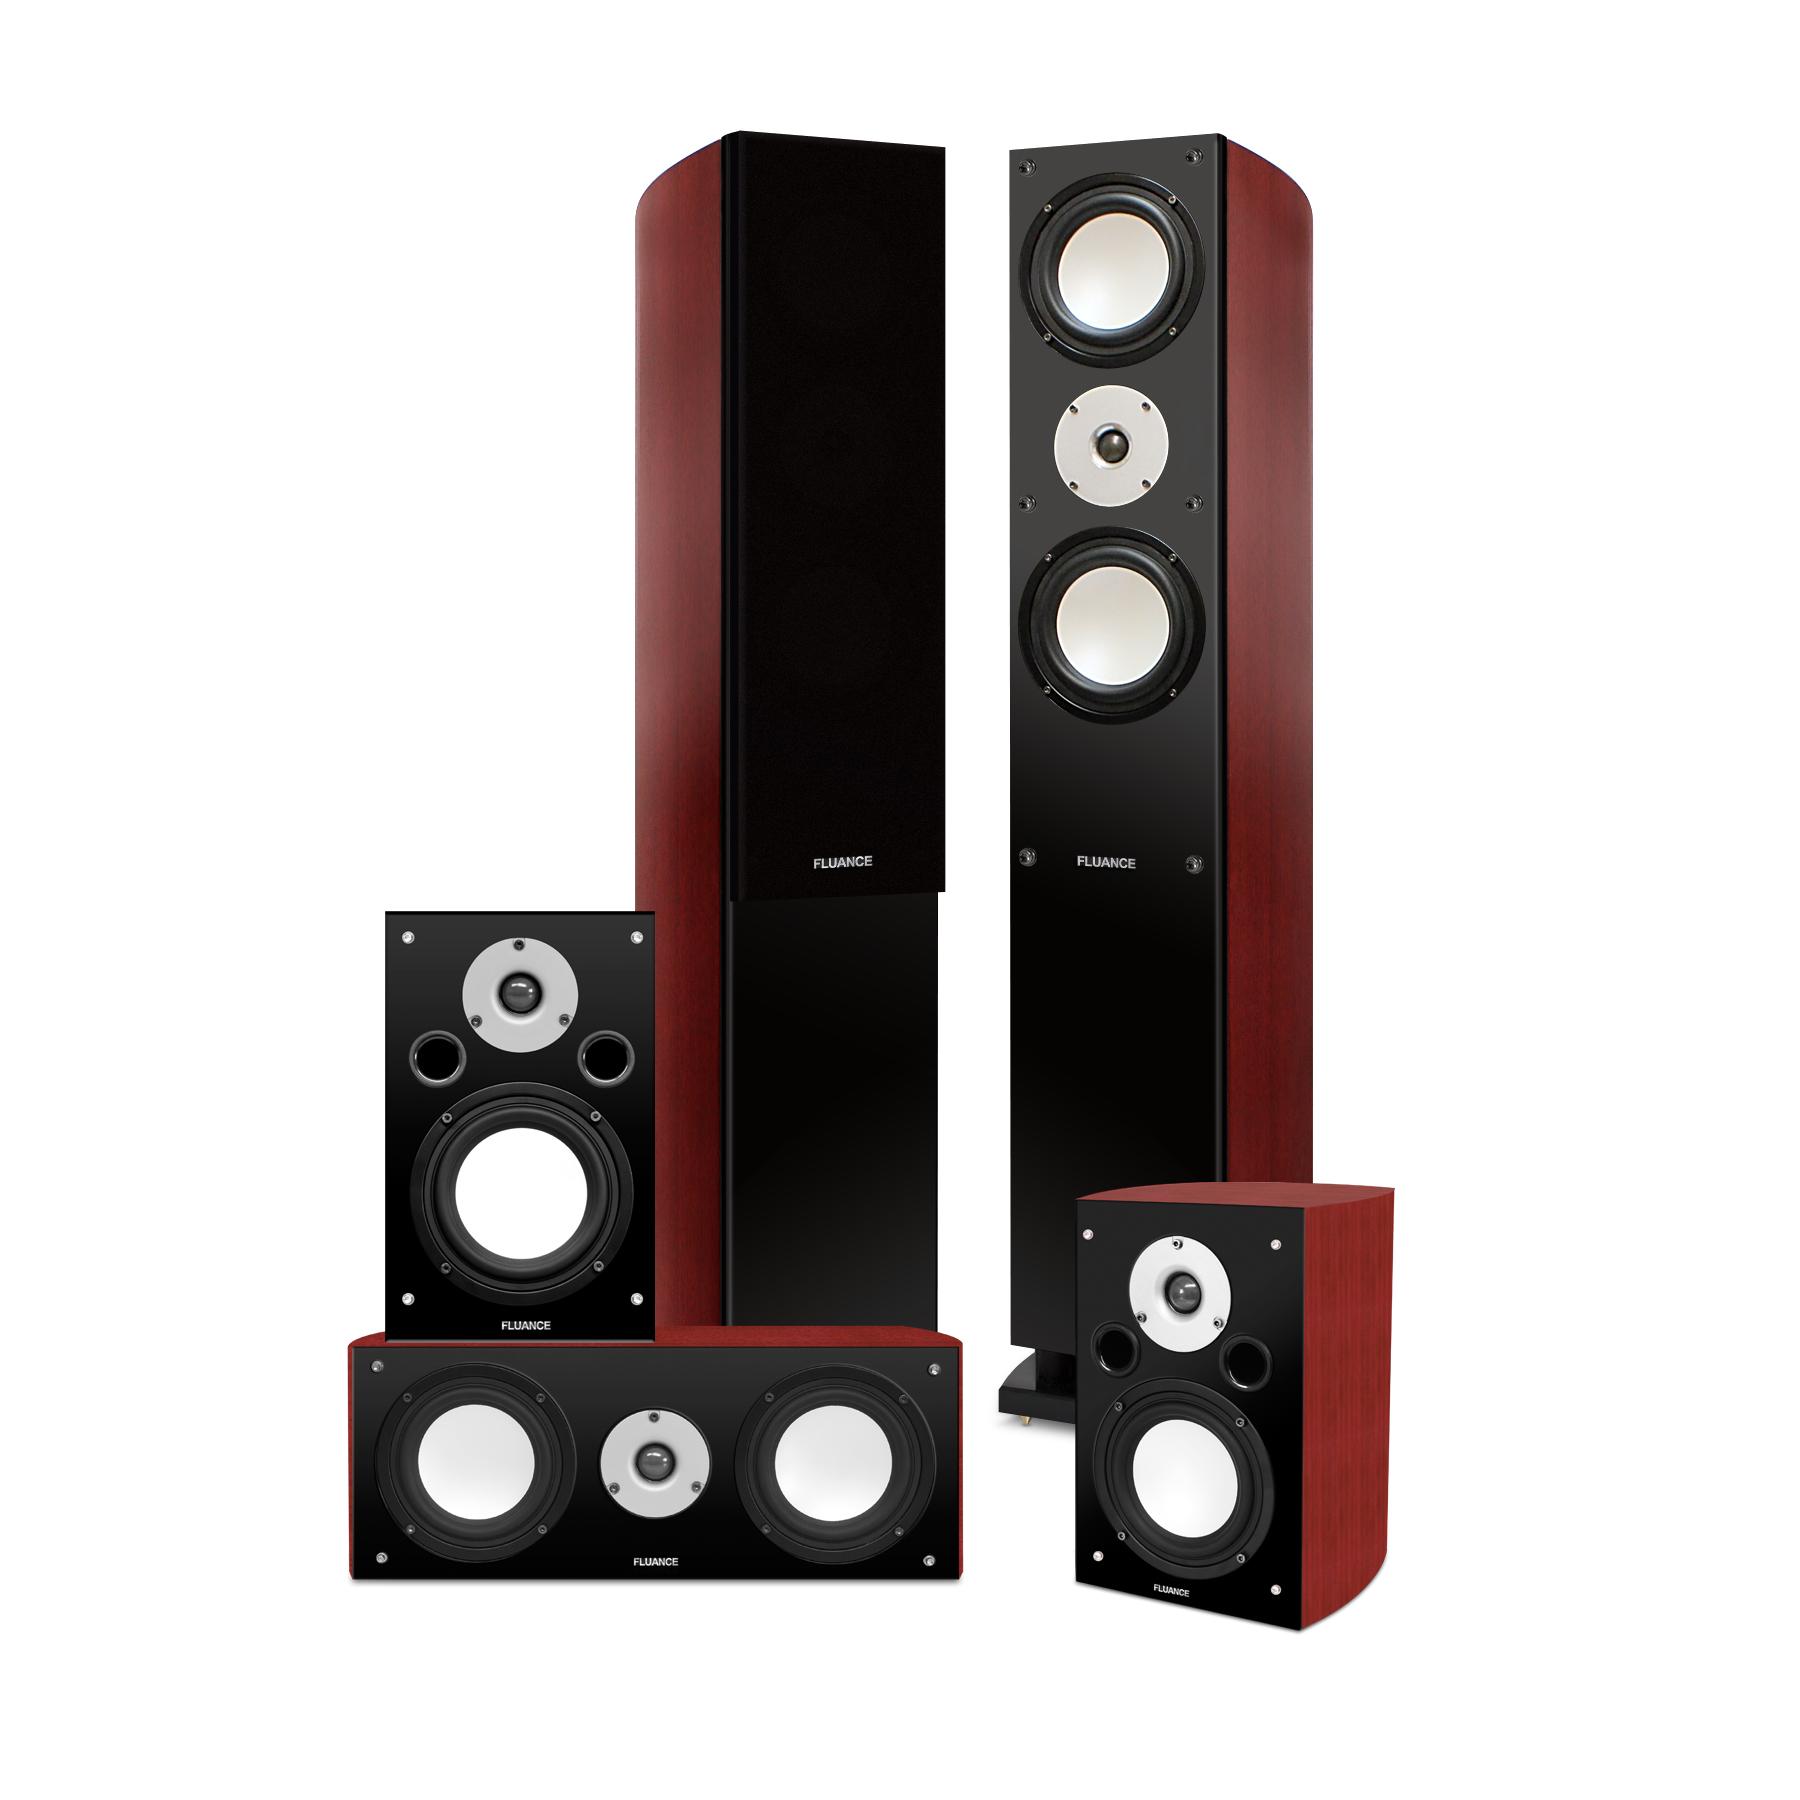 Fluance High Performance 5 Speaker Surround Sound Home Theater System